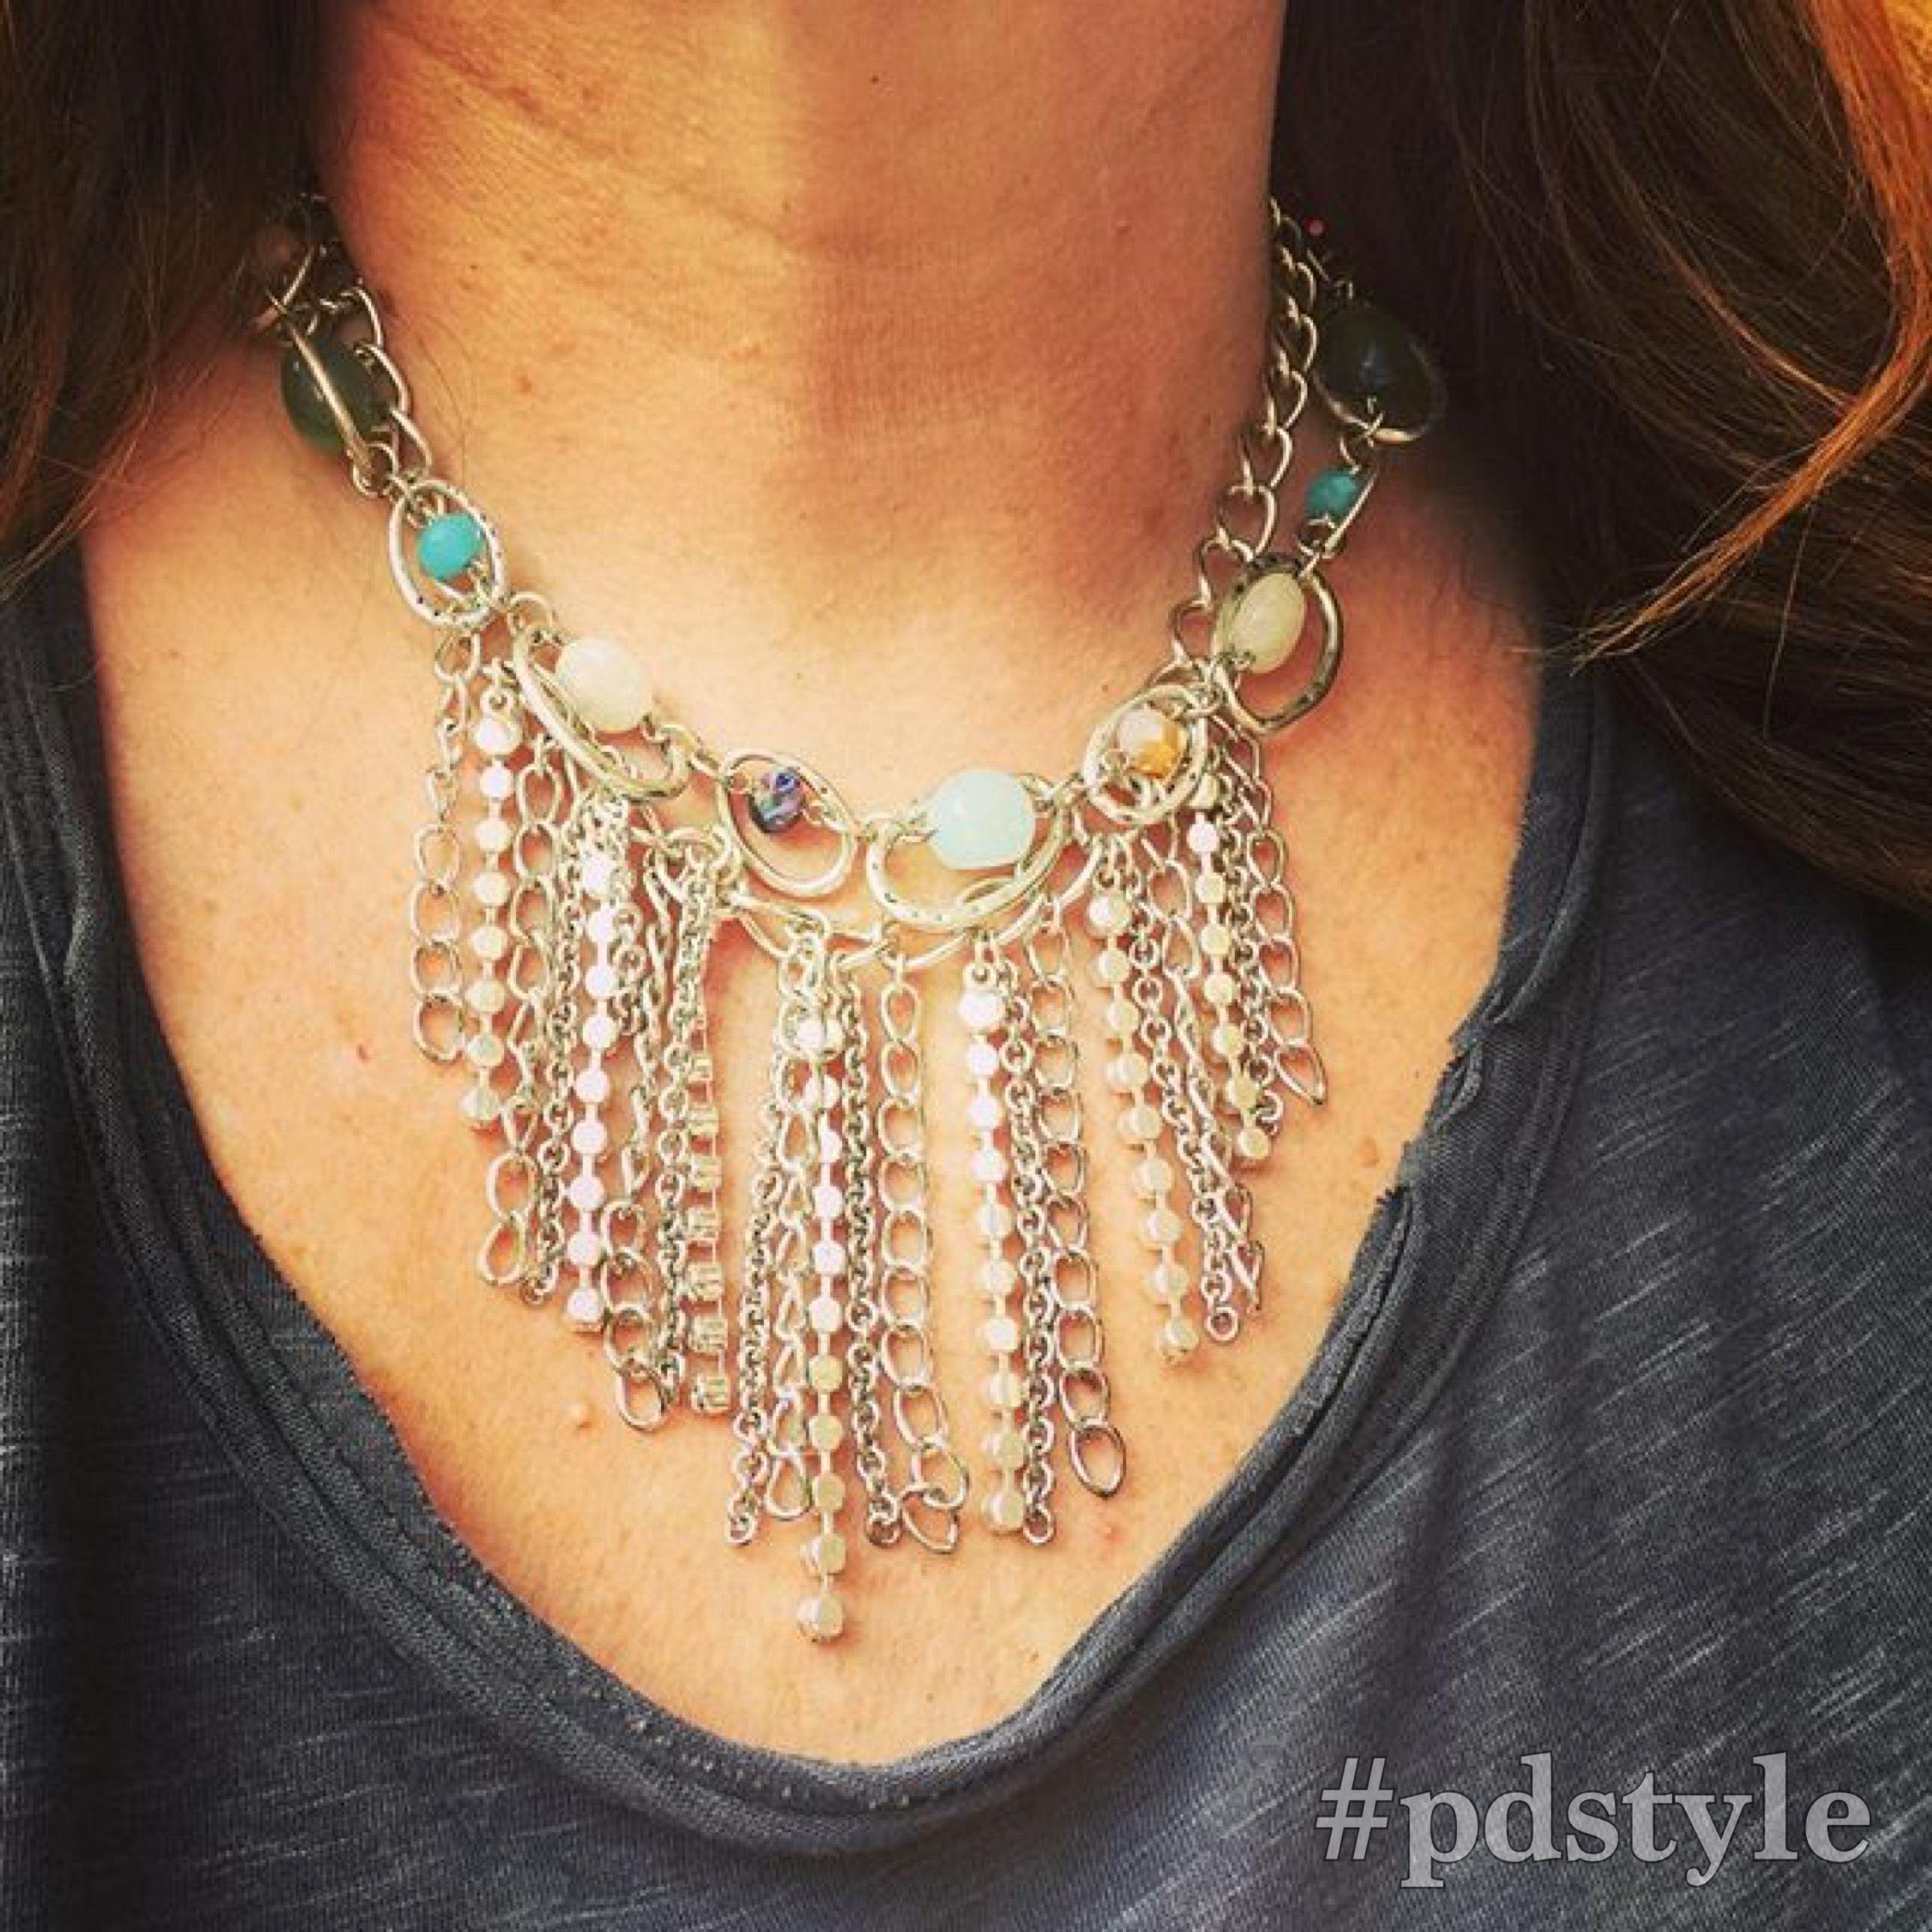 Pin by Shawna Watson on Premier Designs Jewelry-I love my ...